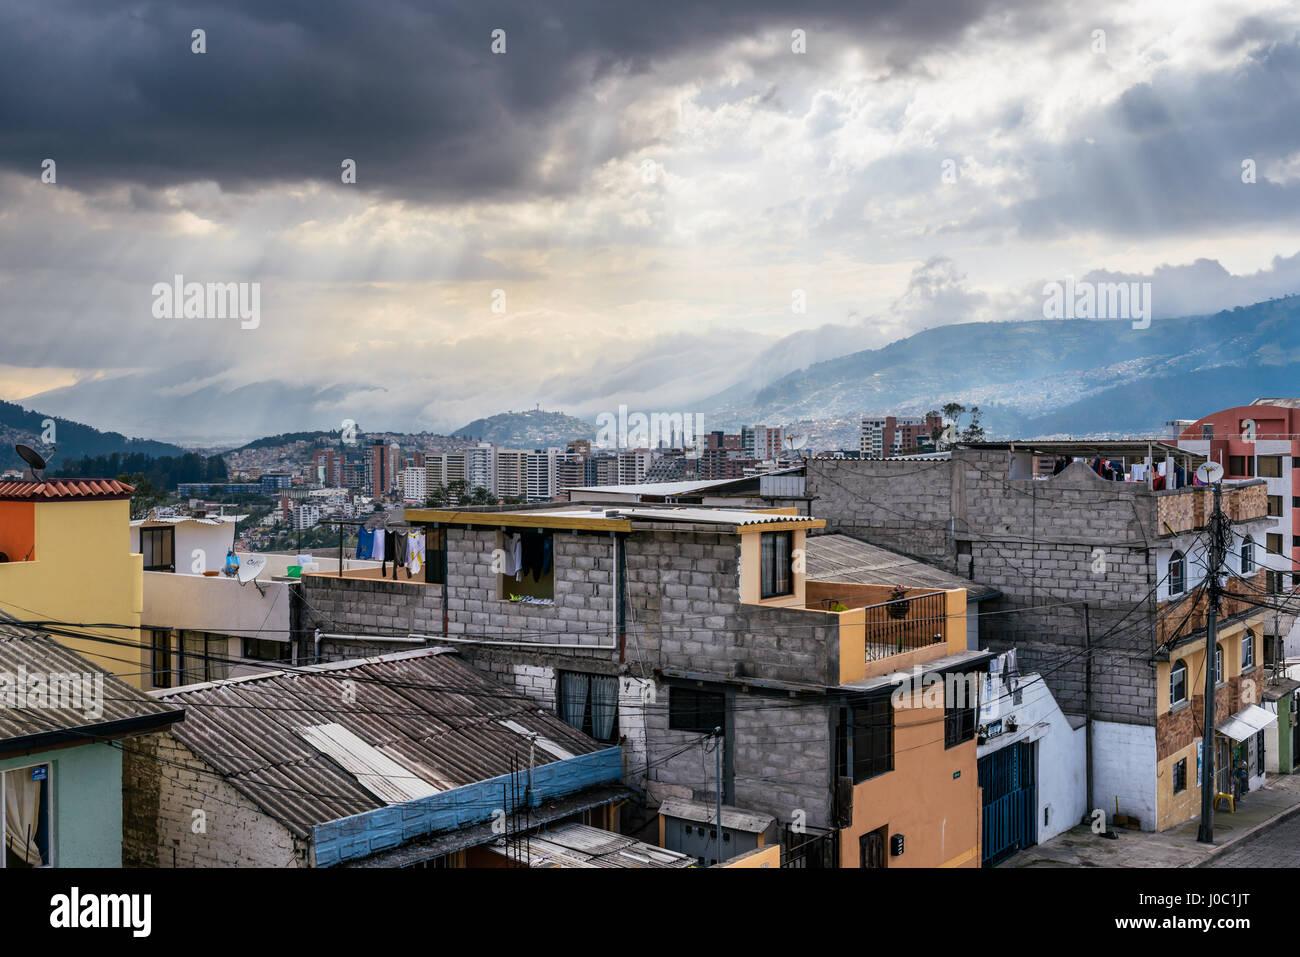 Cityscape of Quito, Ecuador - Stock Image